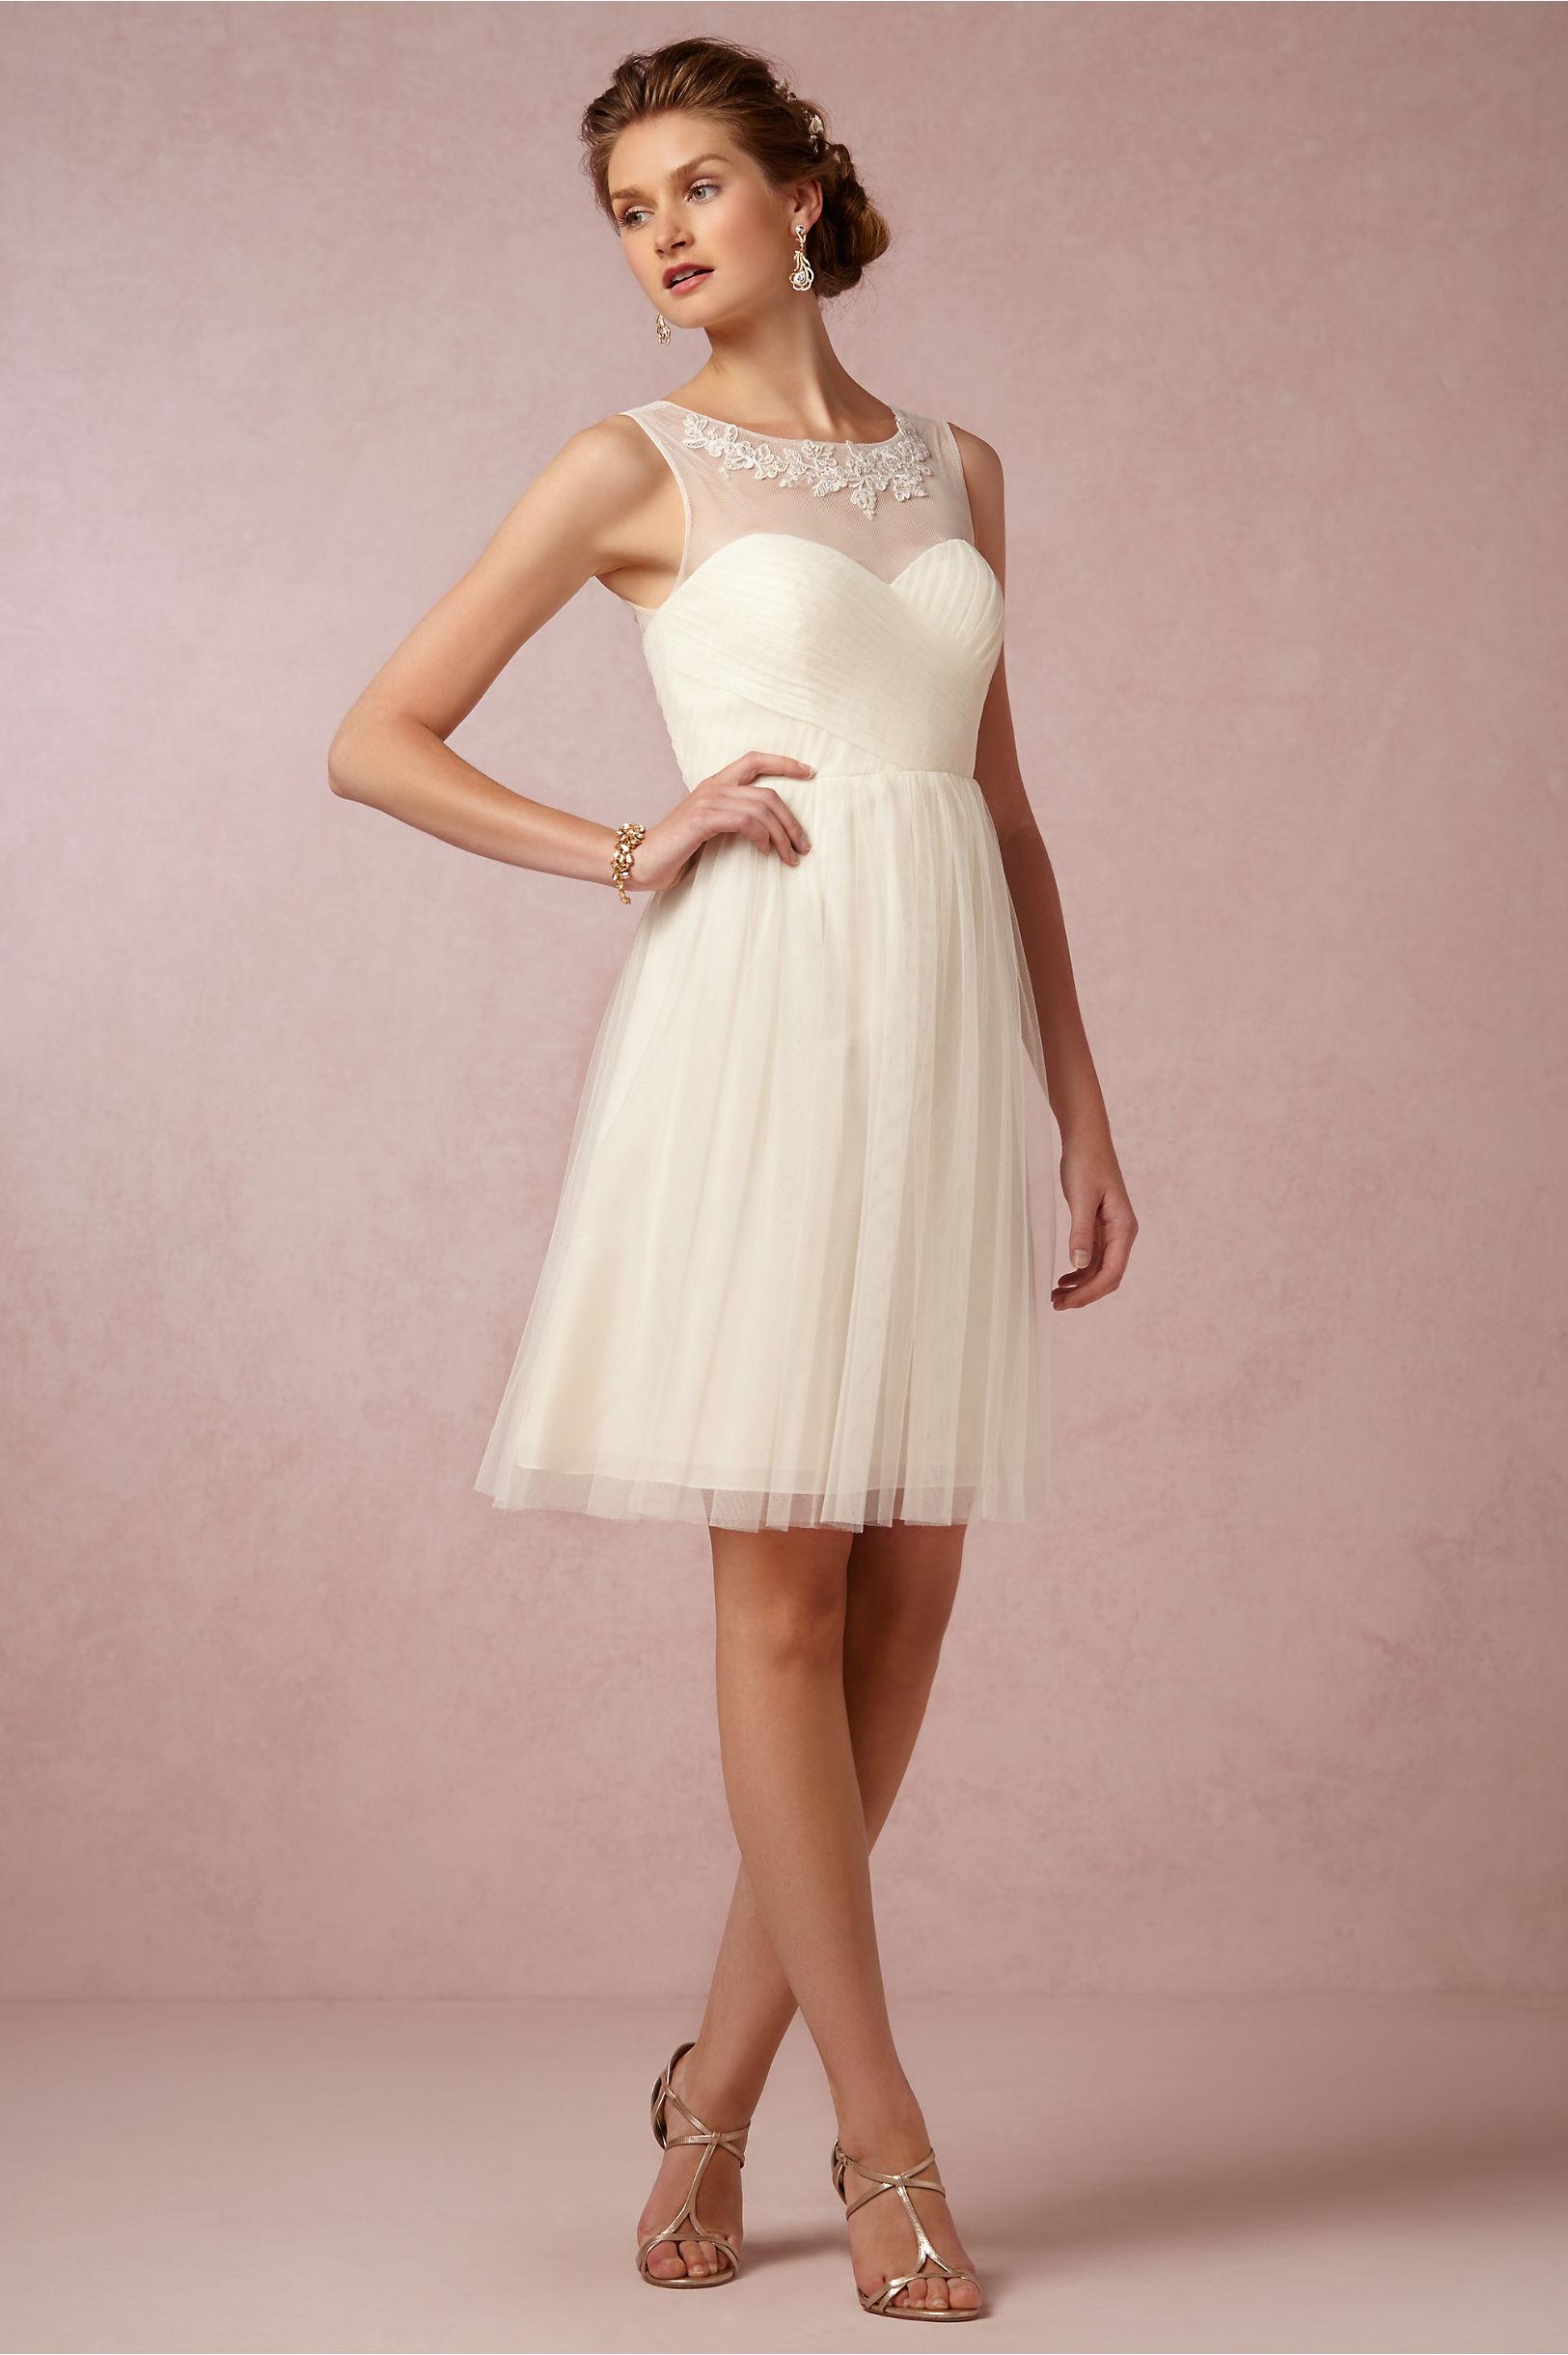 vintage look wedding dresses photo - 1